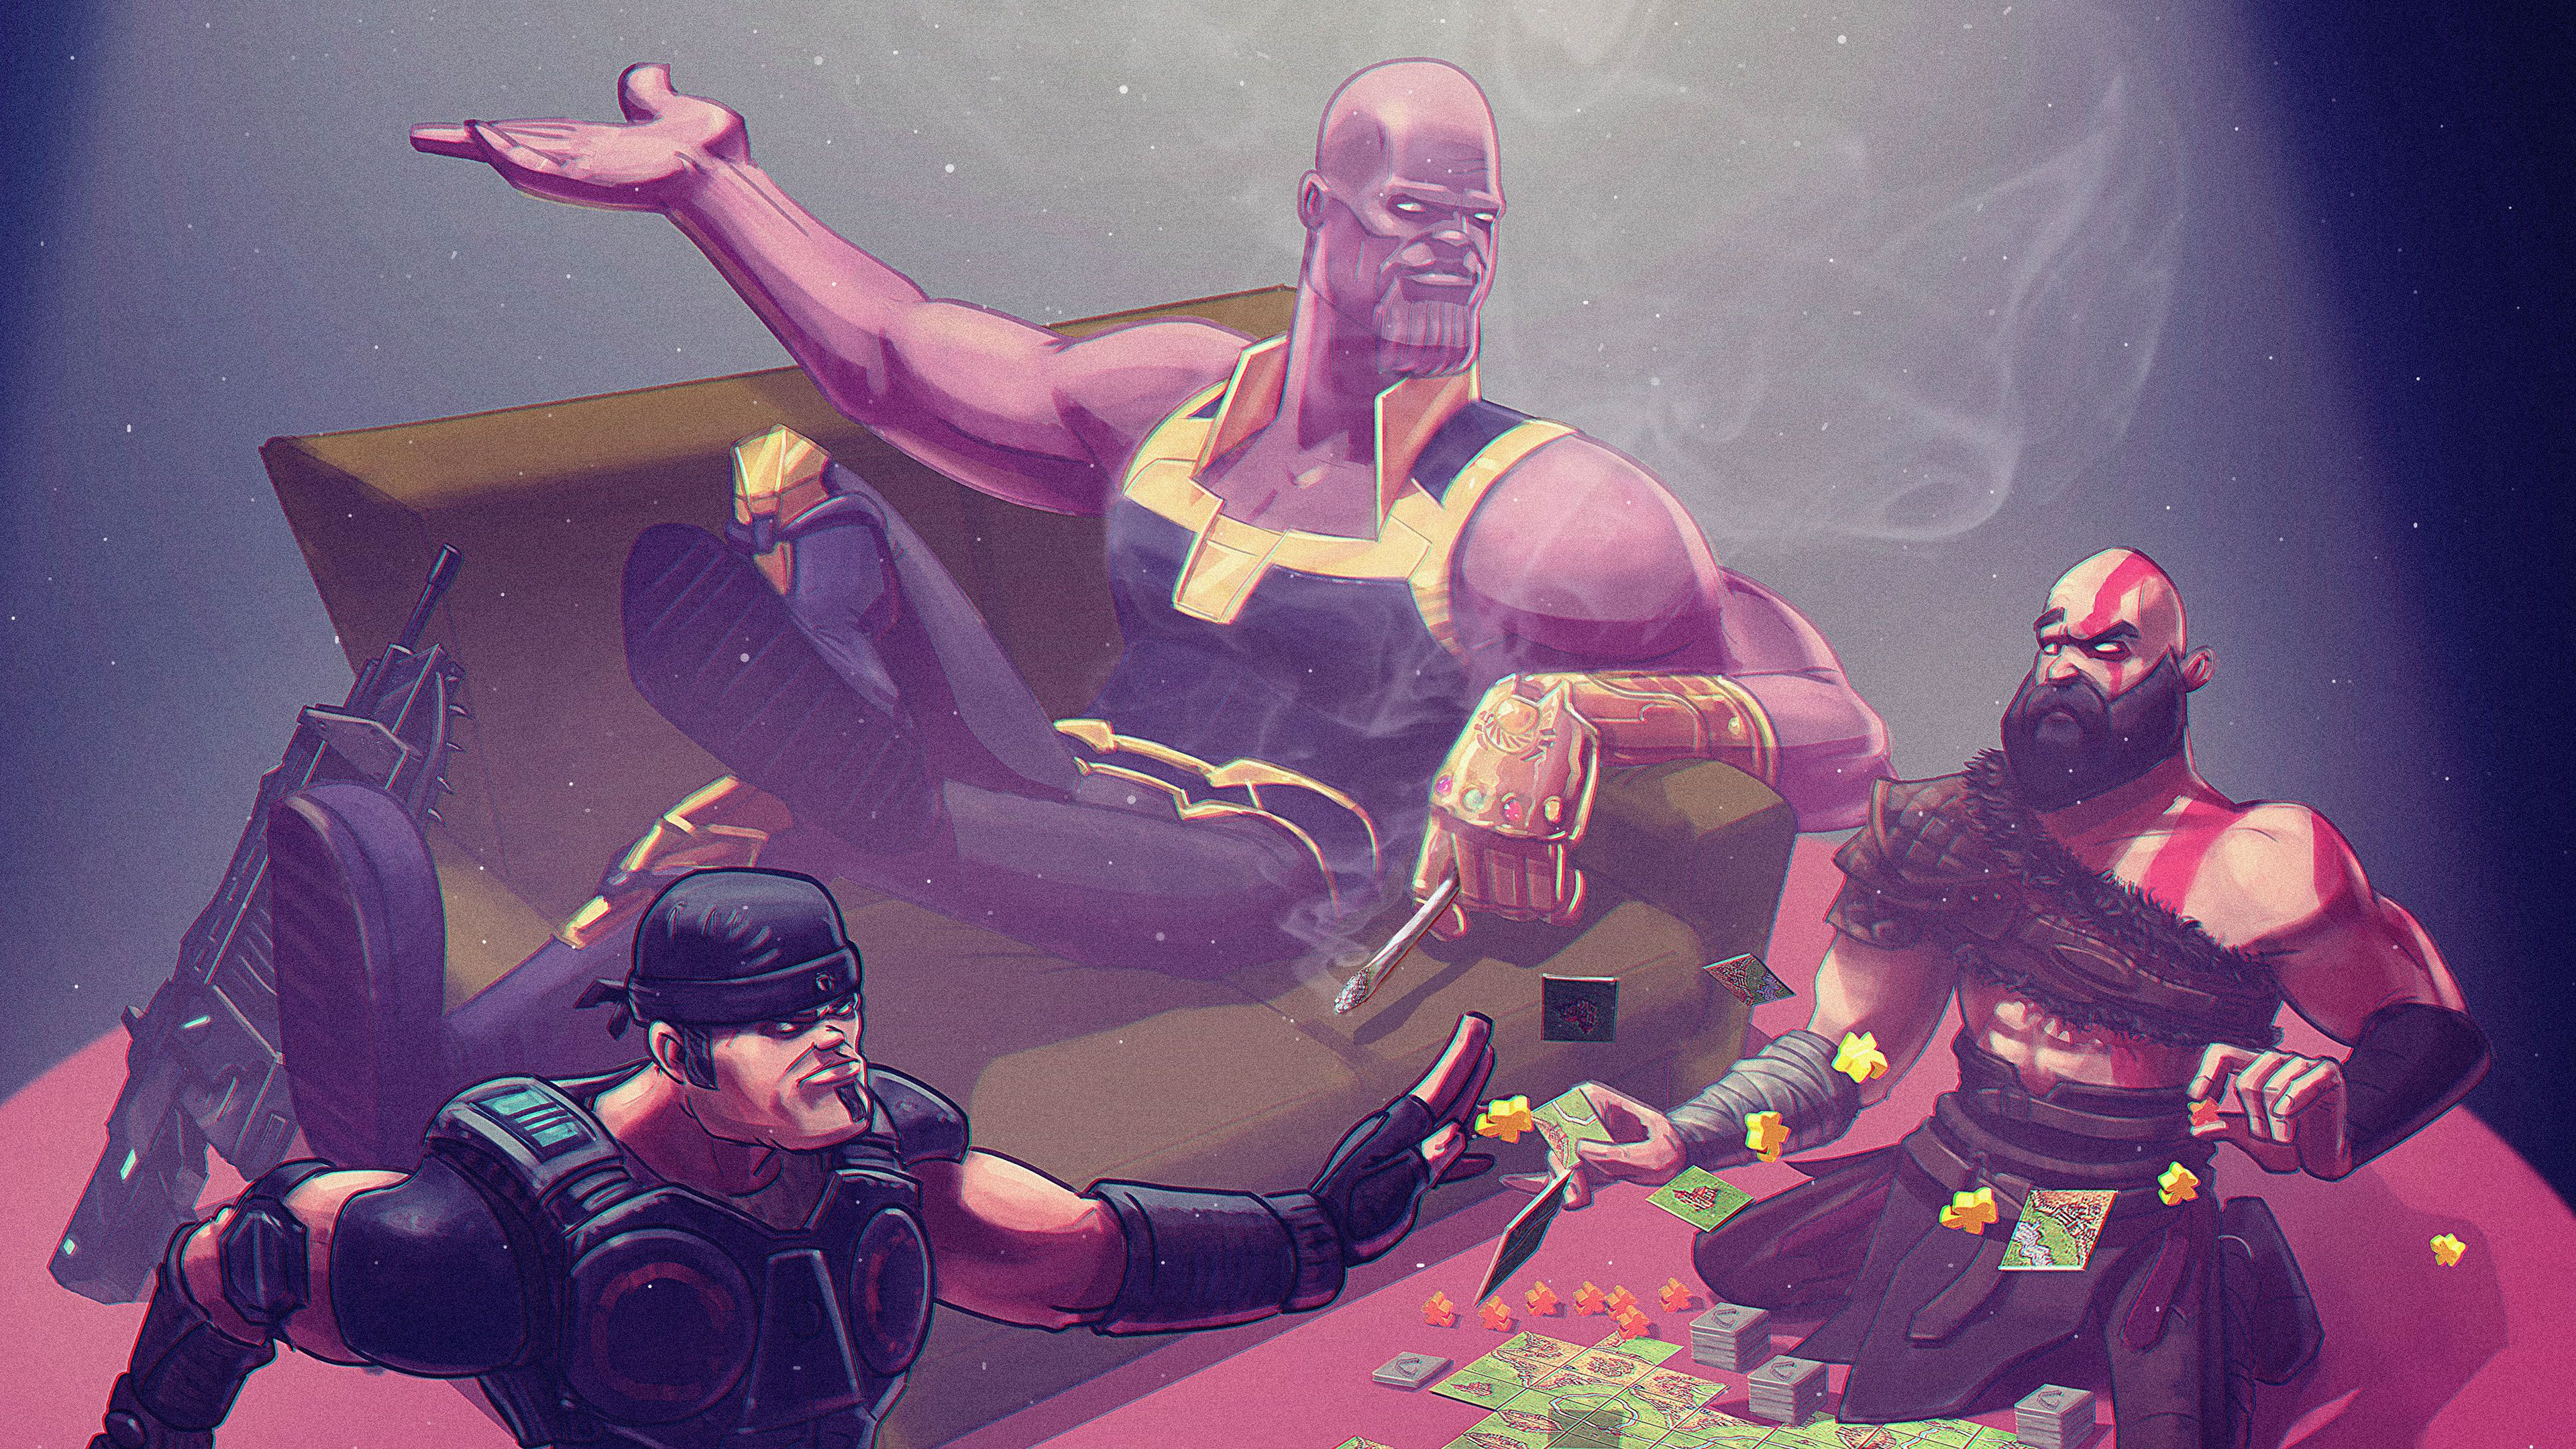 Thanos Kratos 4k Thanos Wallpapers Superheroes Wallpapers Kratos Wallpapers Hd Wallpapers Digital Art Wallpapers Behance W Art Wallpaper Superhero Artwork